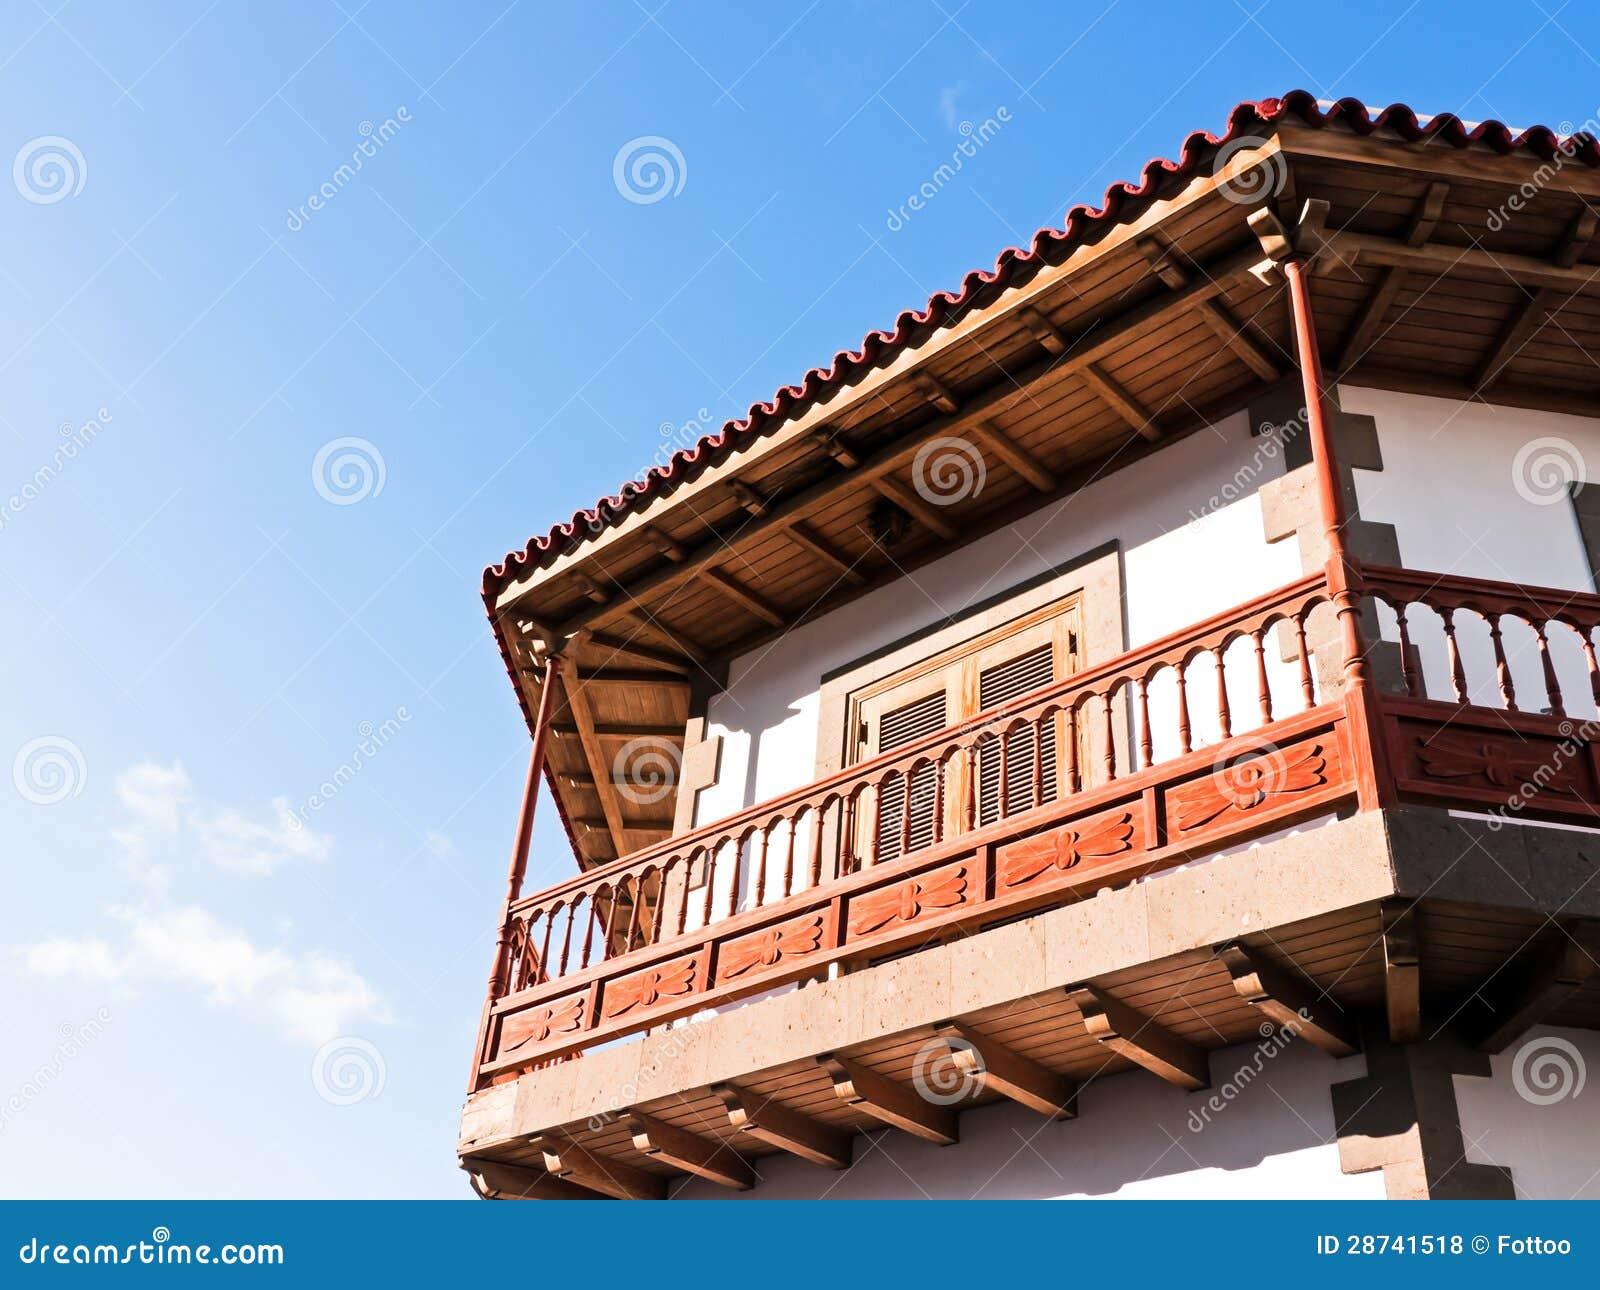 Balc n de madera fotos de archivo libres de regal as imagen 28741518 - Balcones de madera ...